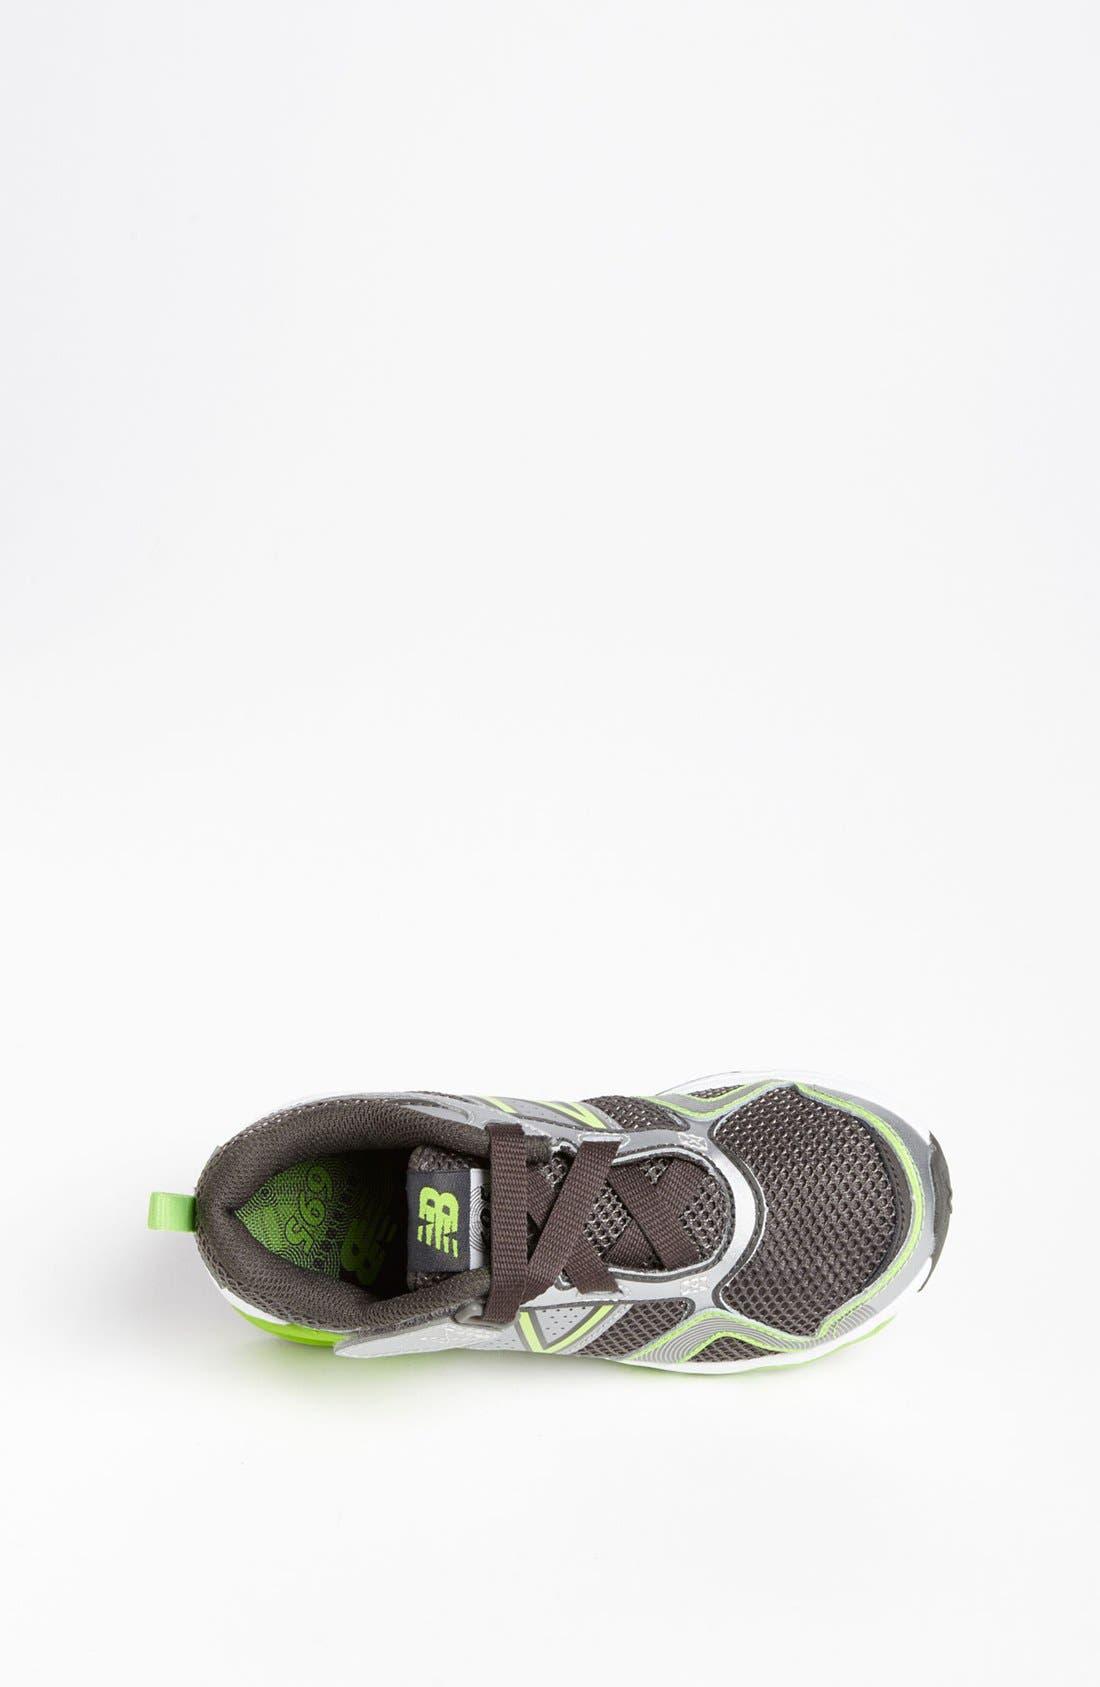 Alternate Image 3  - New Balance '695' Sneaker (Baby, Walker, Toddler, Little Kid & Big Kid) (Online Only)